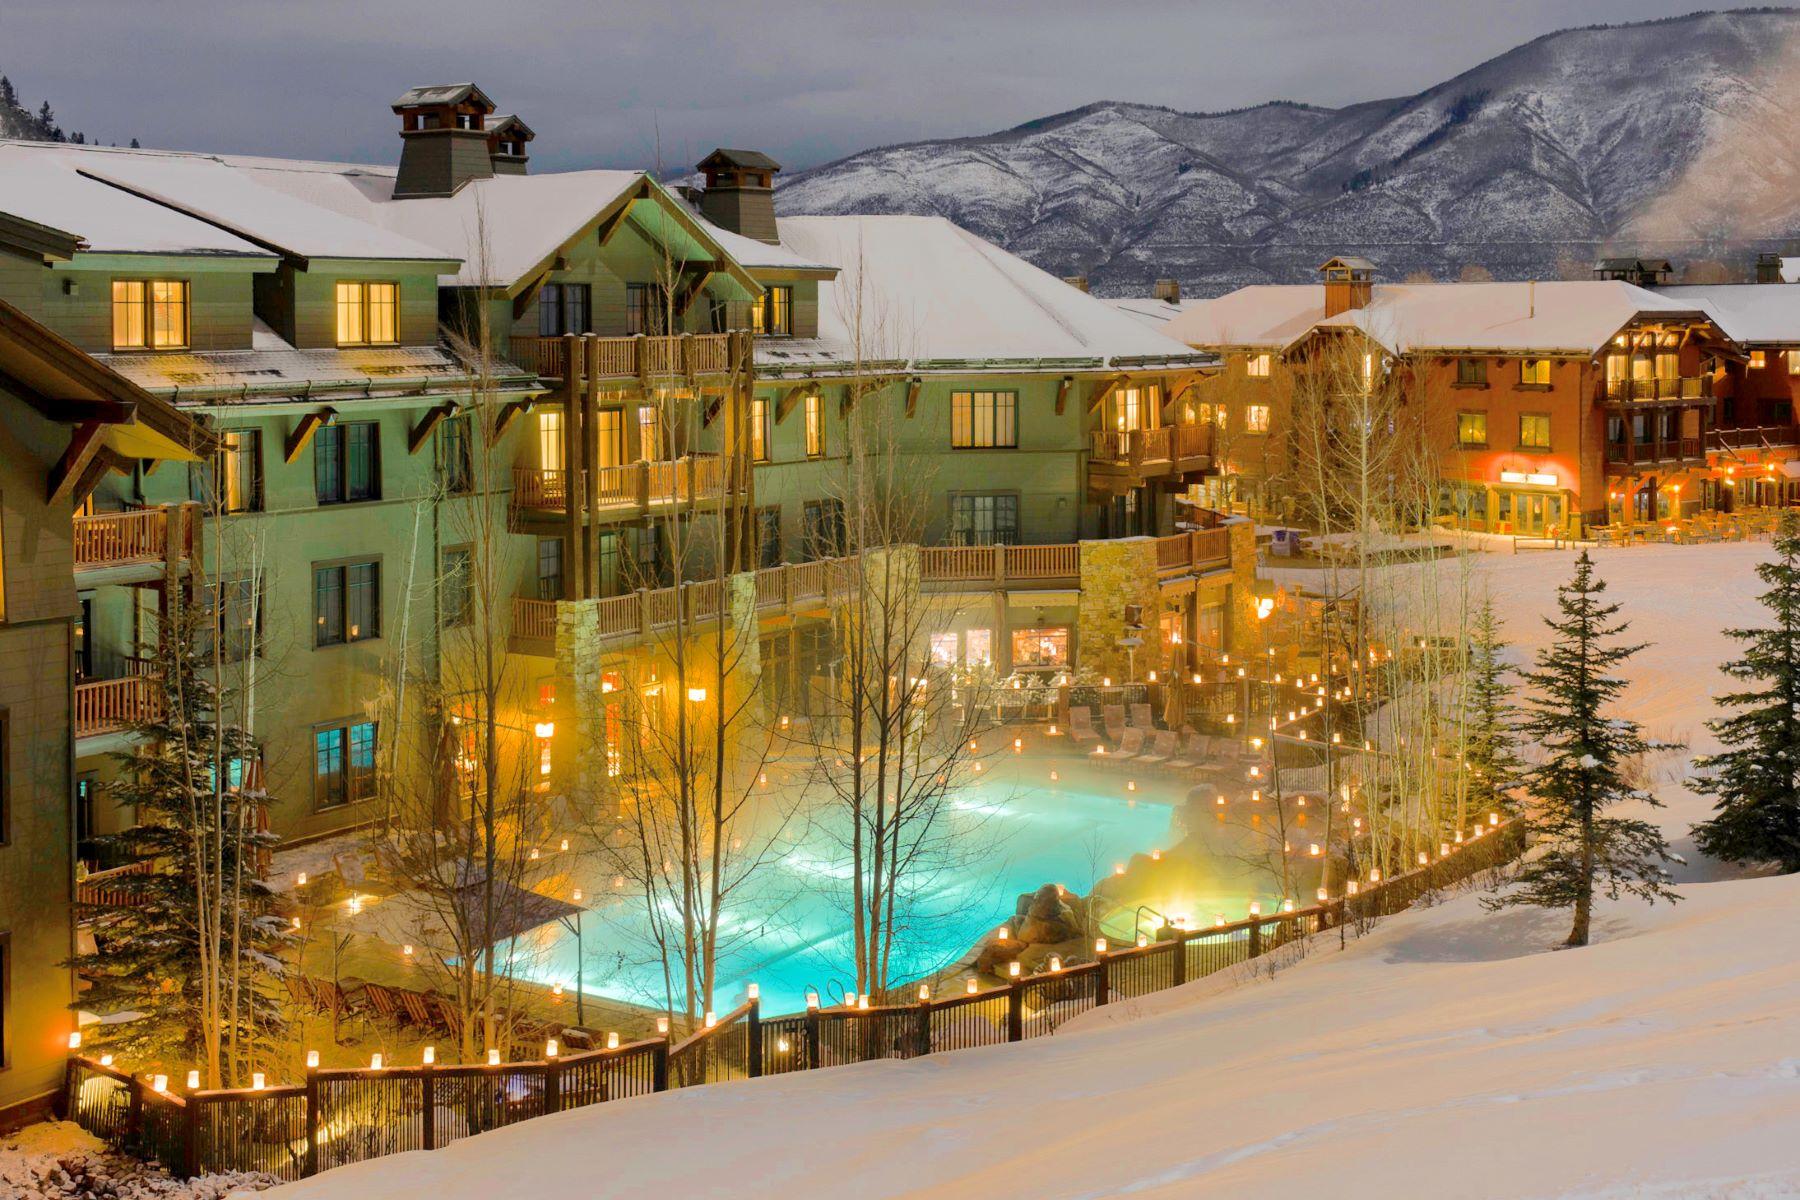 Sở hữu theo phần vì Bán tại Ritz-Carlton Club Fractional Ownership, 8202, Summer Interest 10 0075 Prospector Road 8202/10 Aspen, Colorado, 81611 Hoa Kỳ